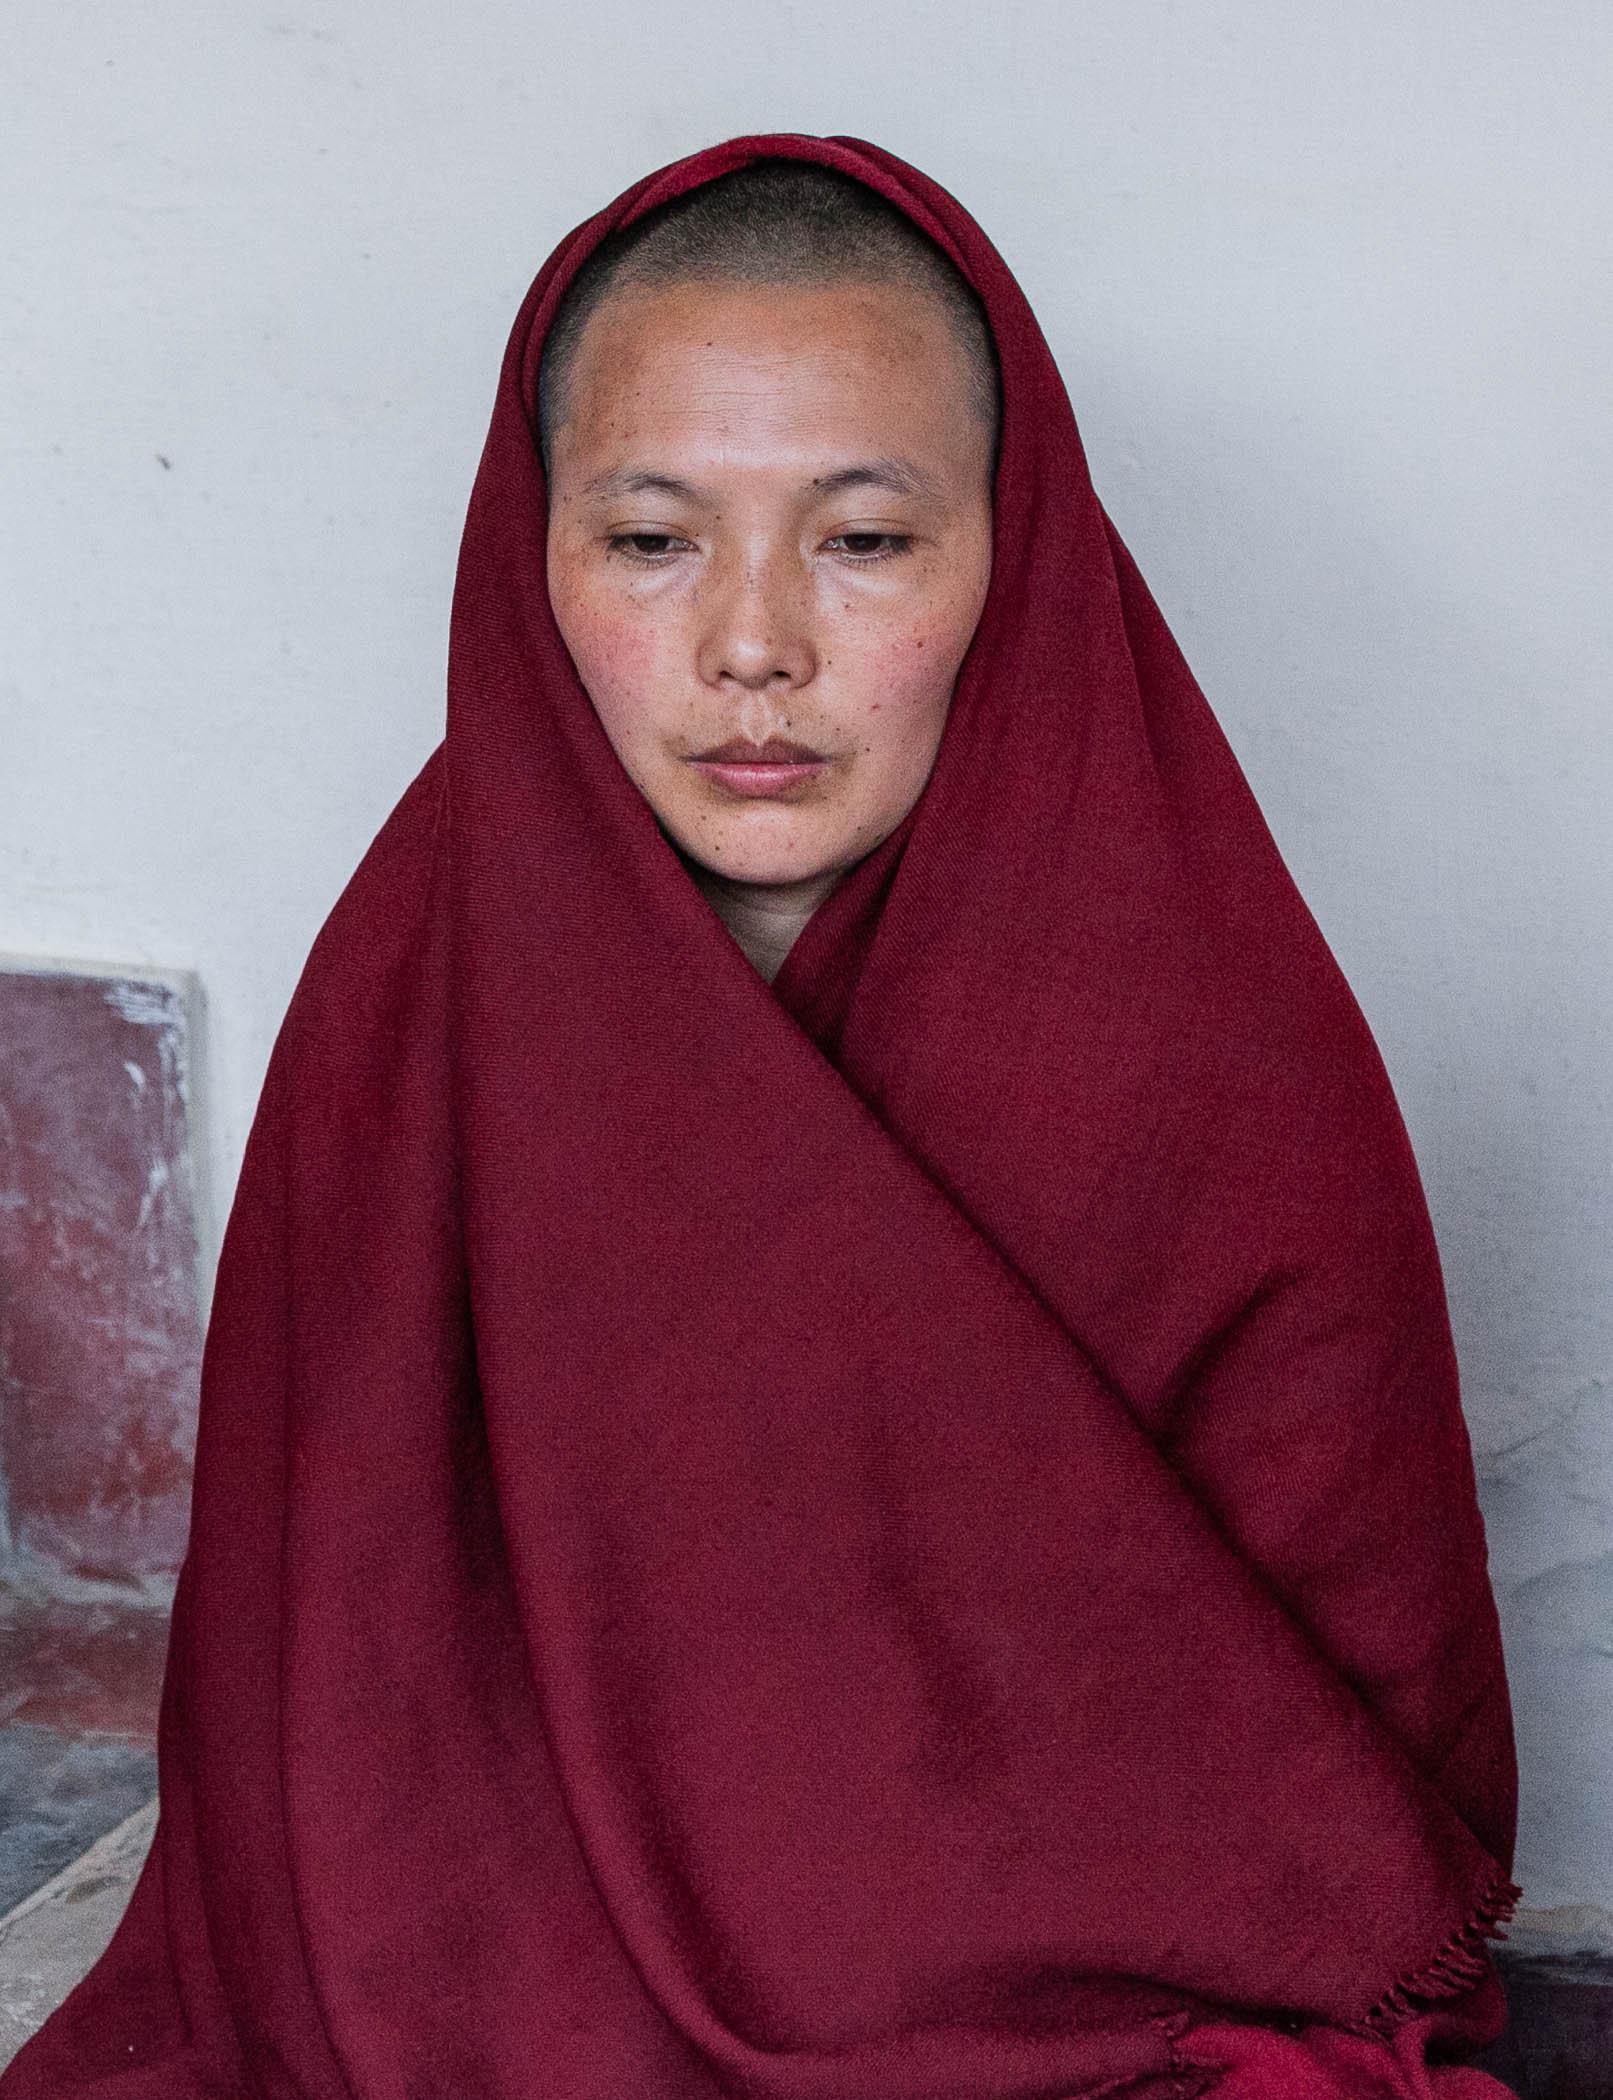 Nun in Meditation